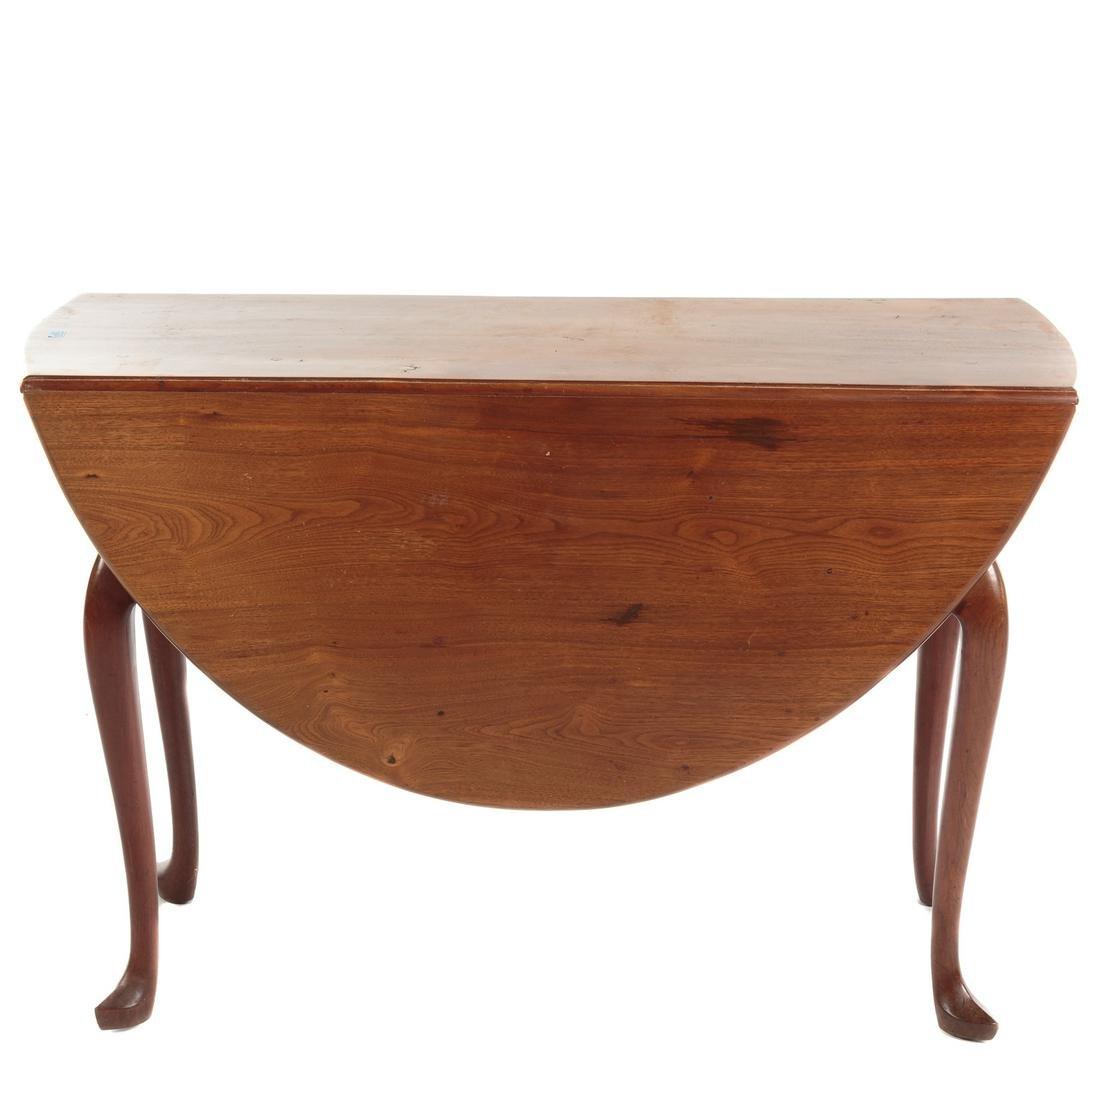 George II Walnut Drop Leaf Table